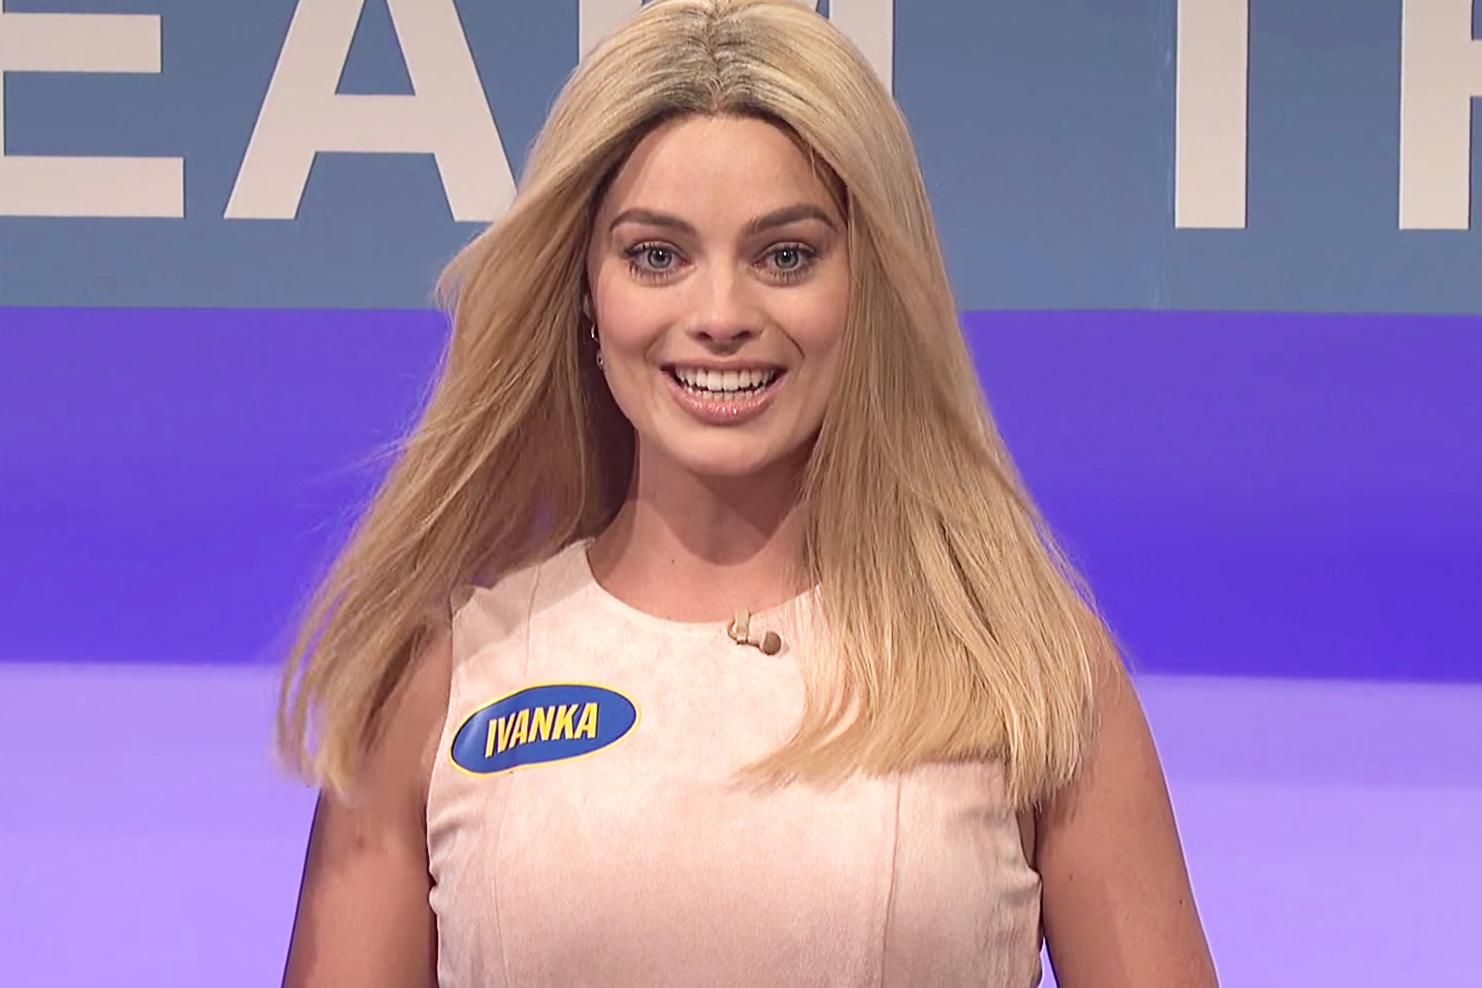 Watch Margot Robbie's Flawless Impression of Ivanka Trump on 'SNL'